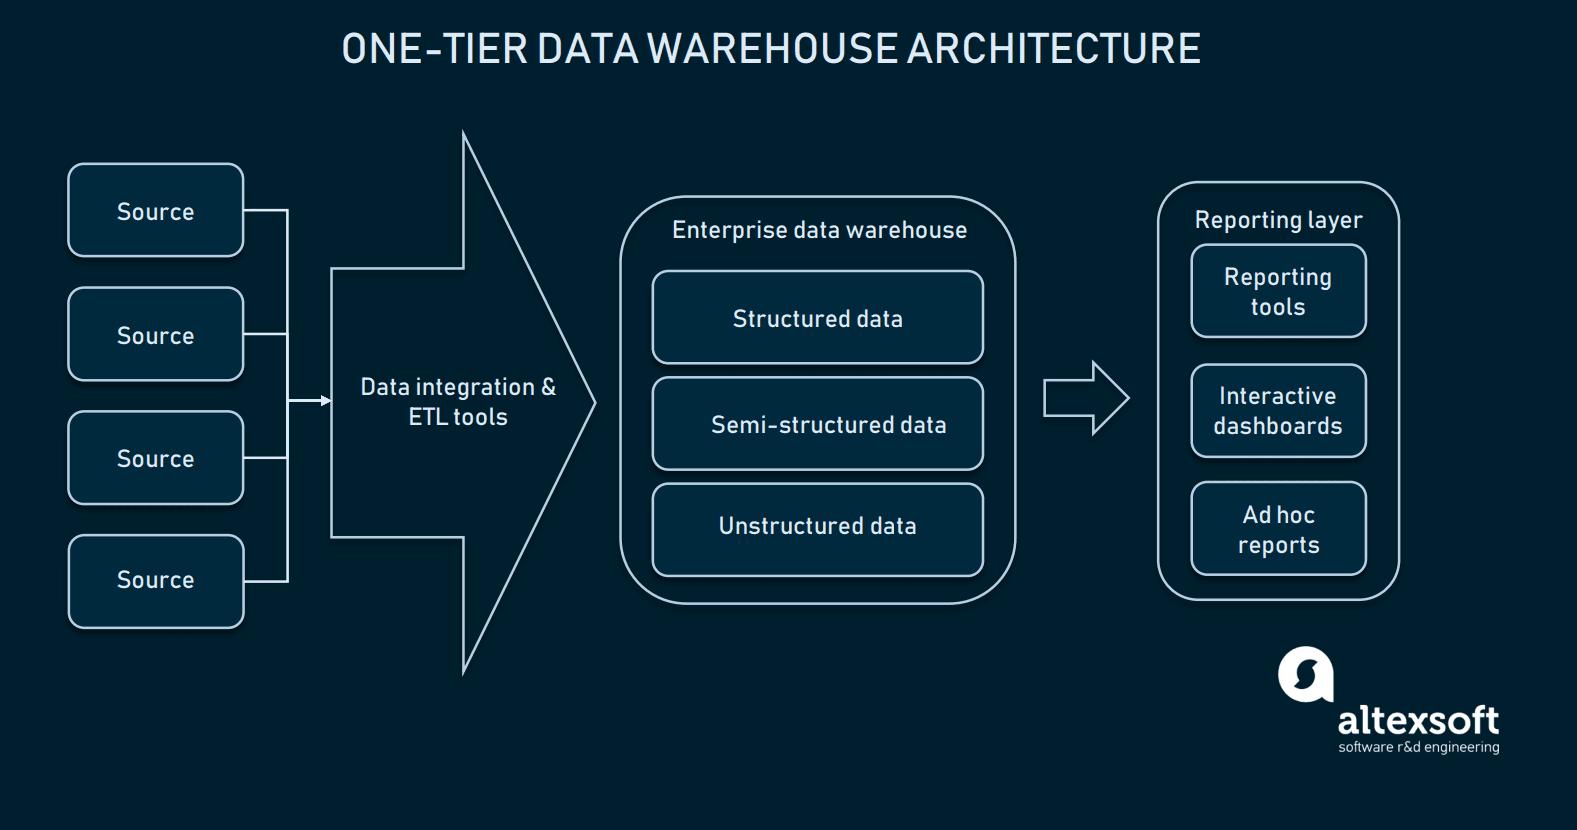 One-tier data warehouse architecture